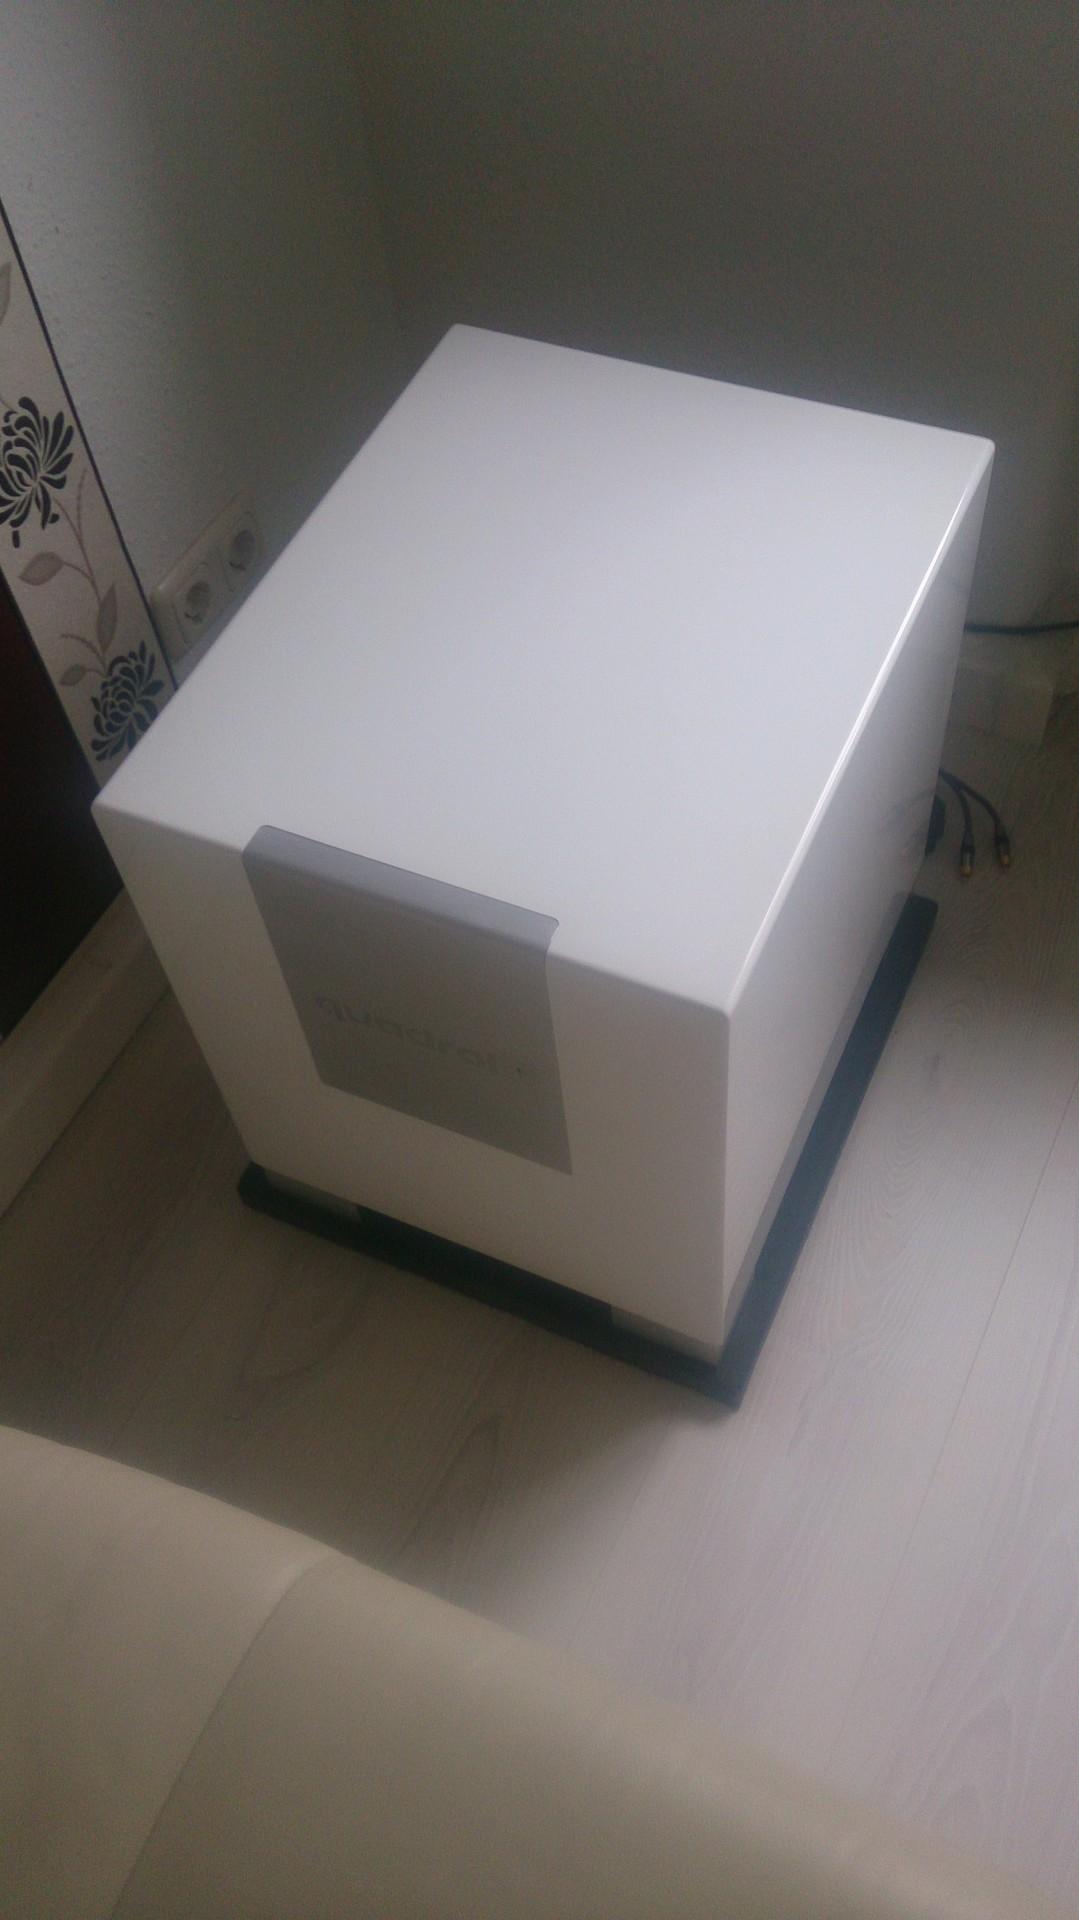 mein wei er cube 12 cube wei er hifi bildergalerie. Black Bedroom Furniture Sets. Home Design Ideas